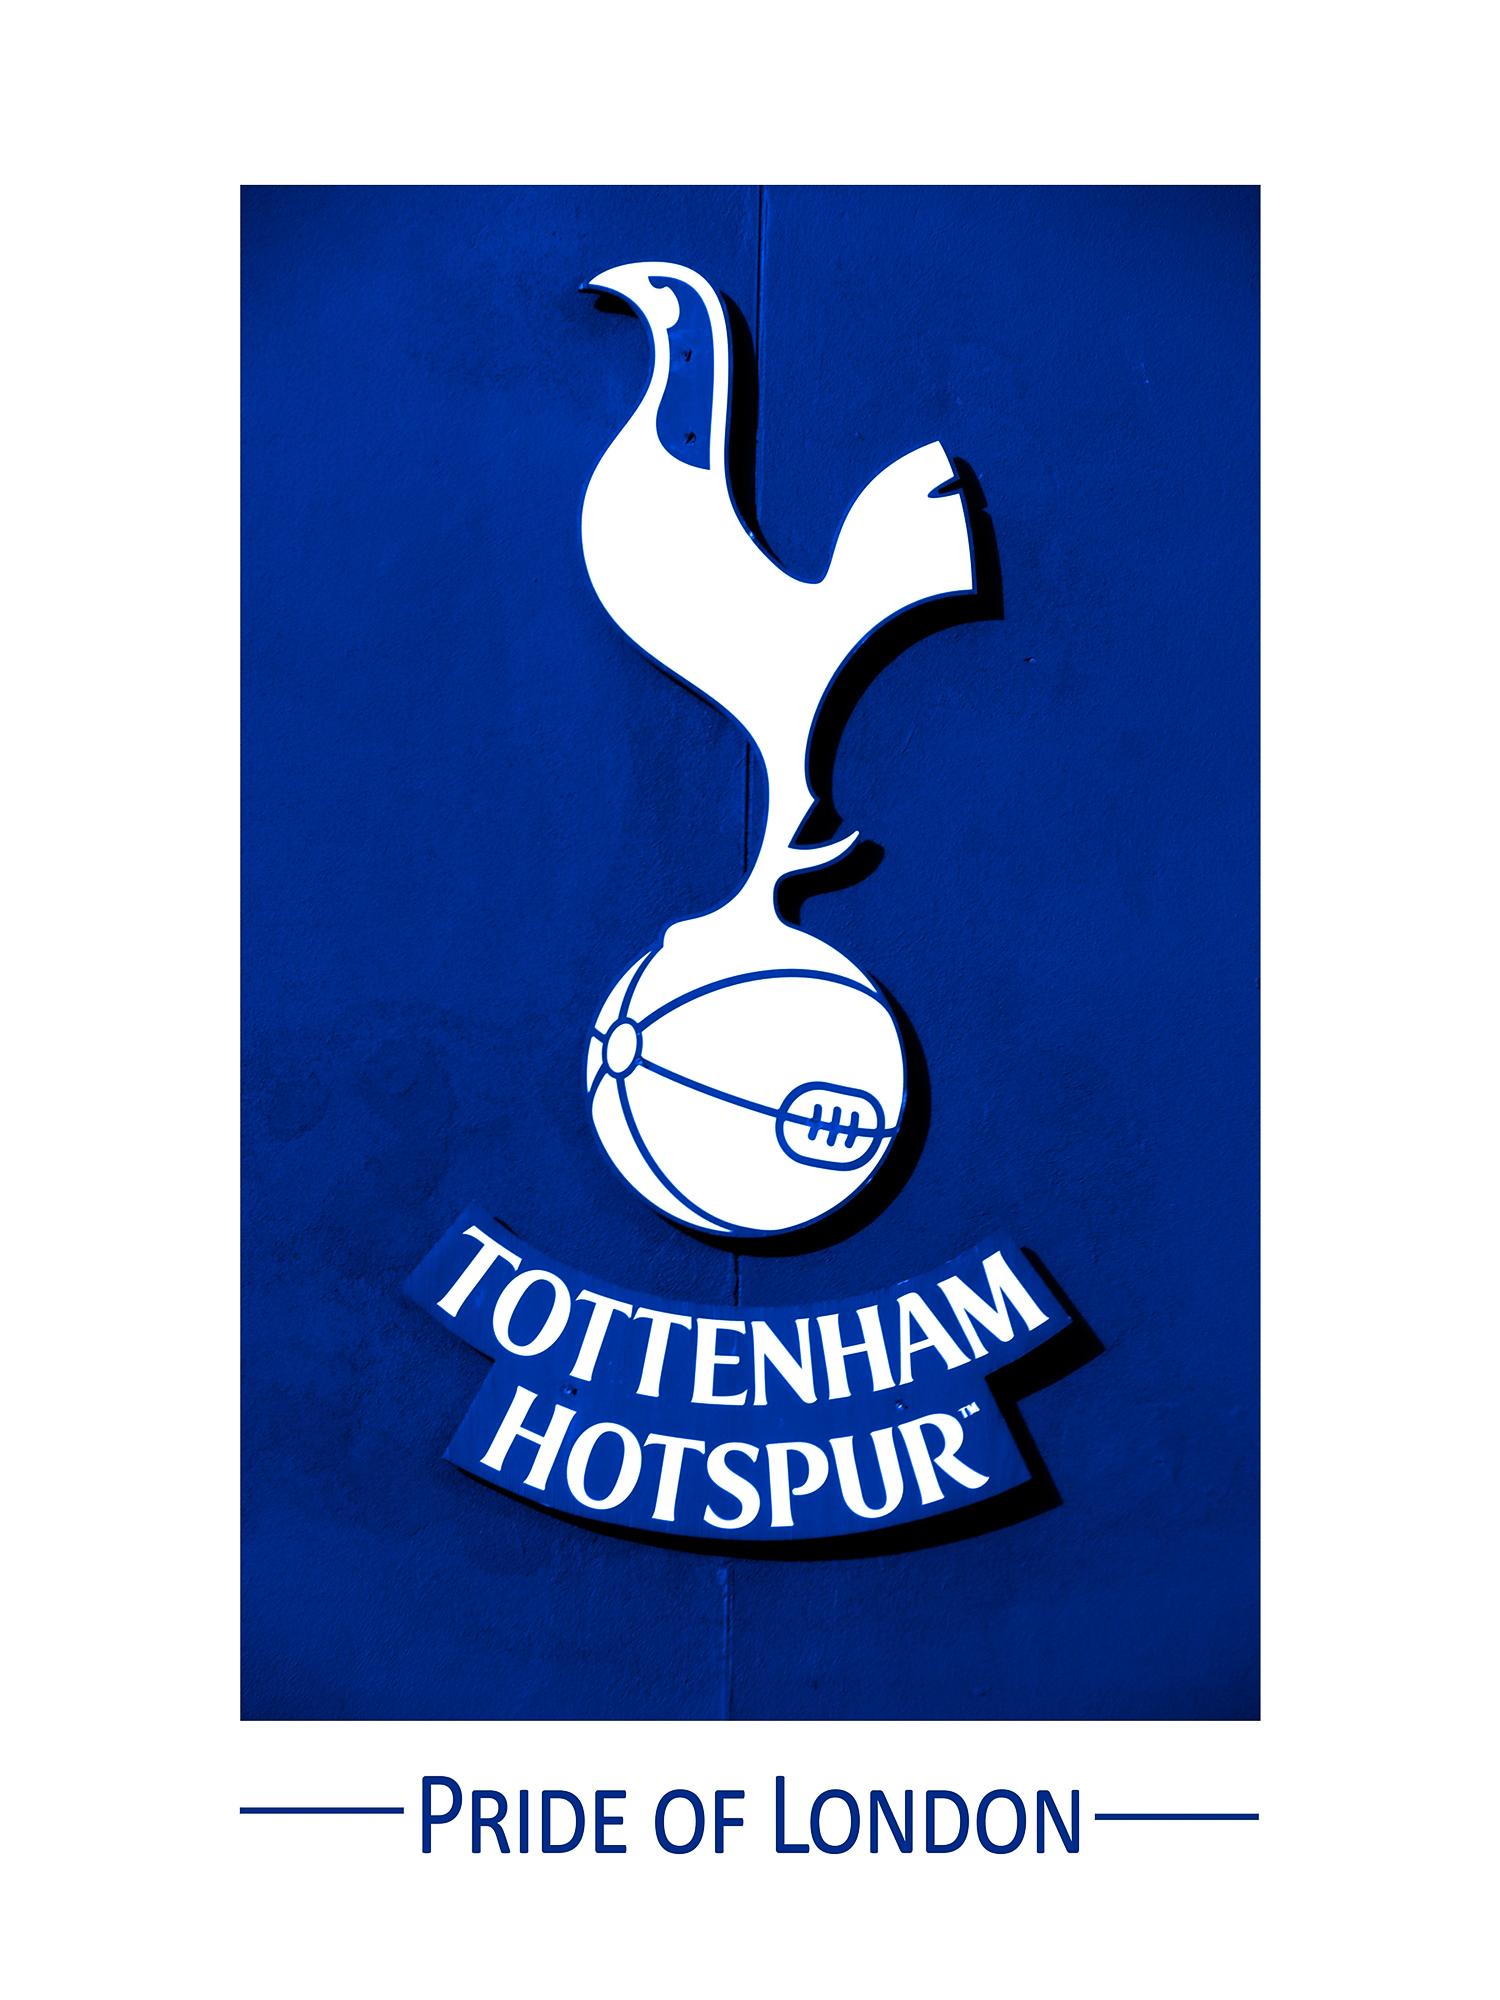 Tottenham Hostpsur Football Club